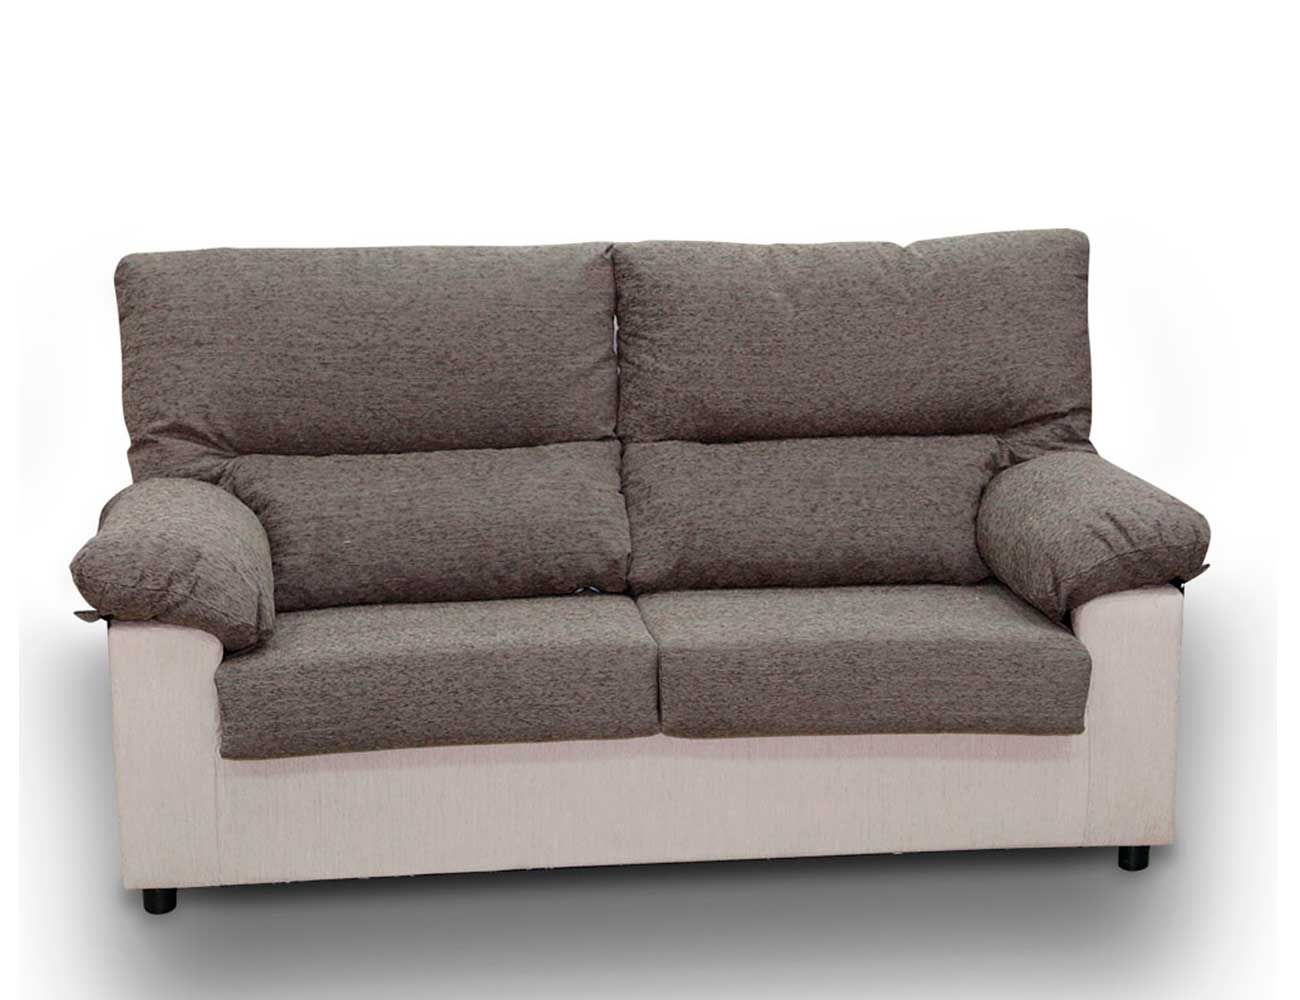 Sofa 3 plazas barato27